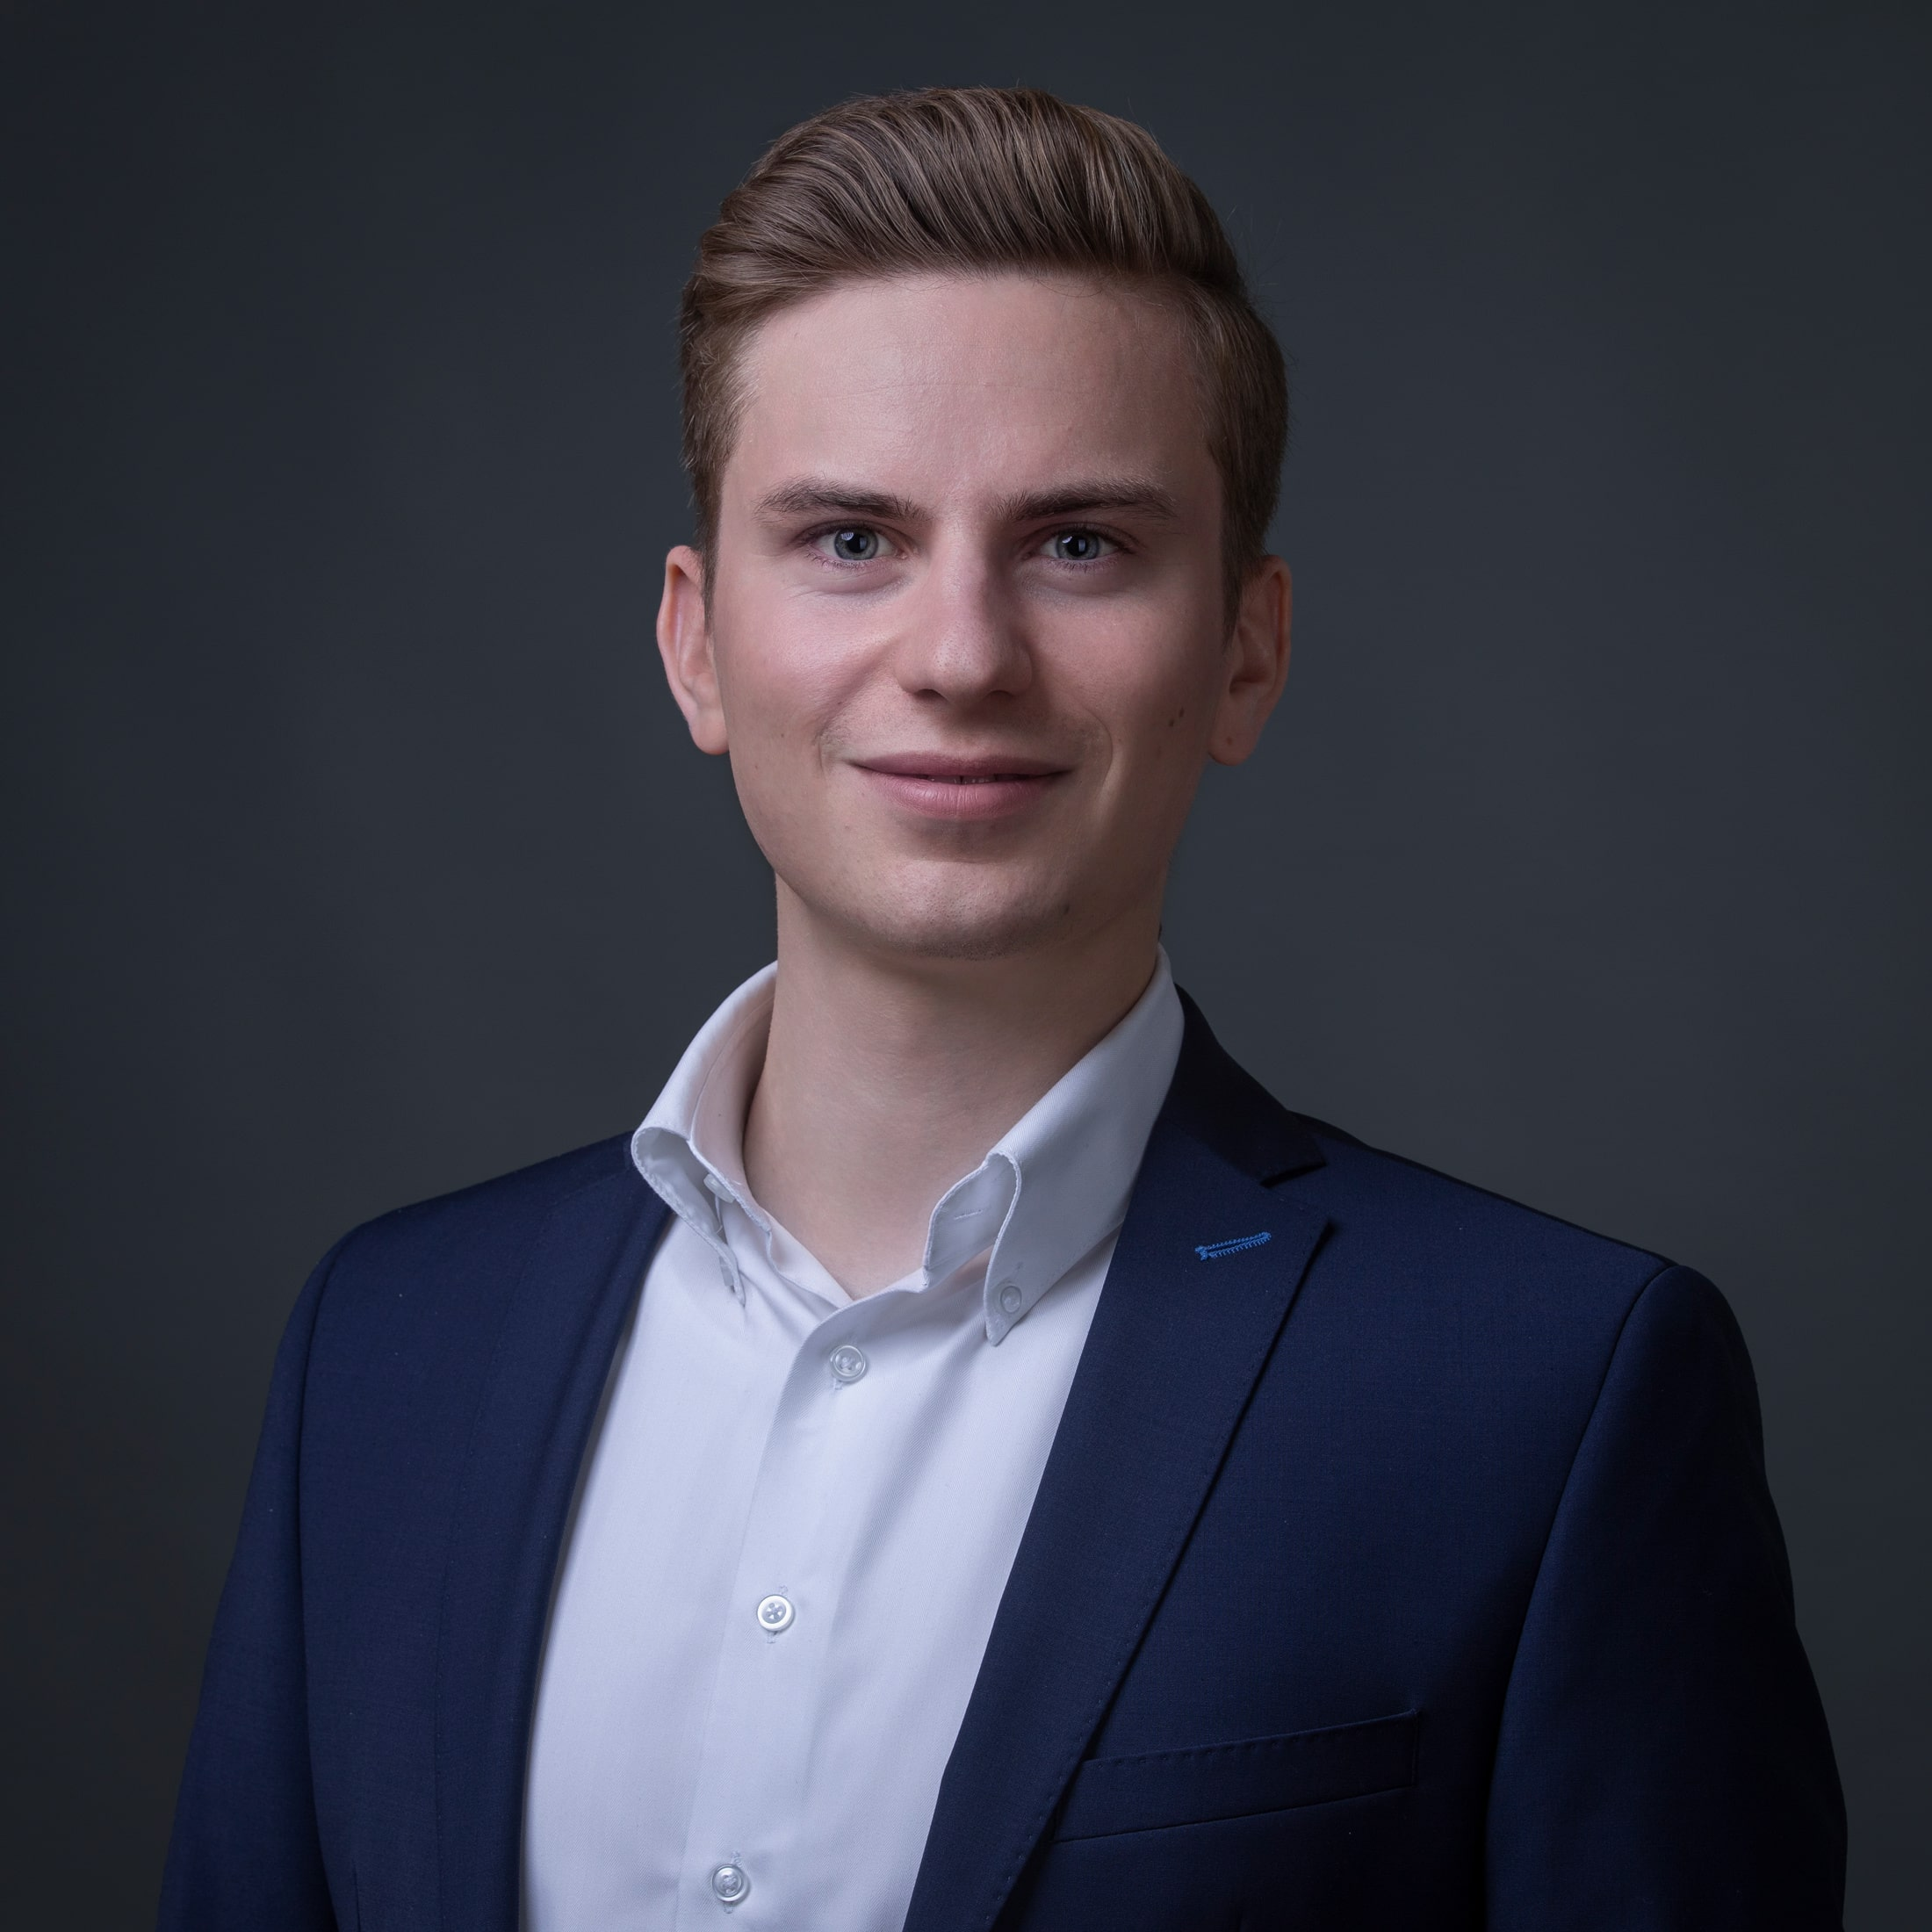 Marlon Hüttebreucker